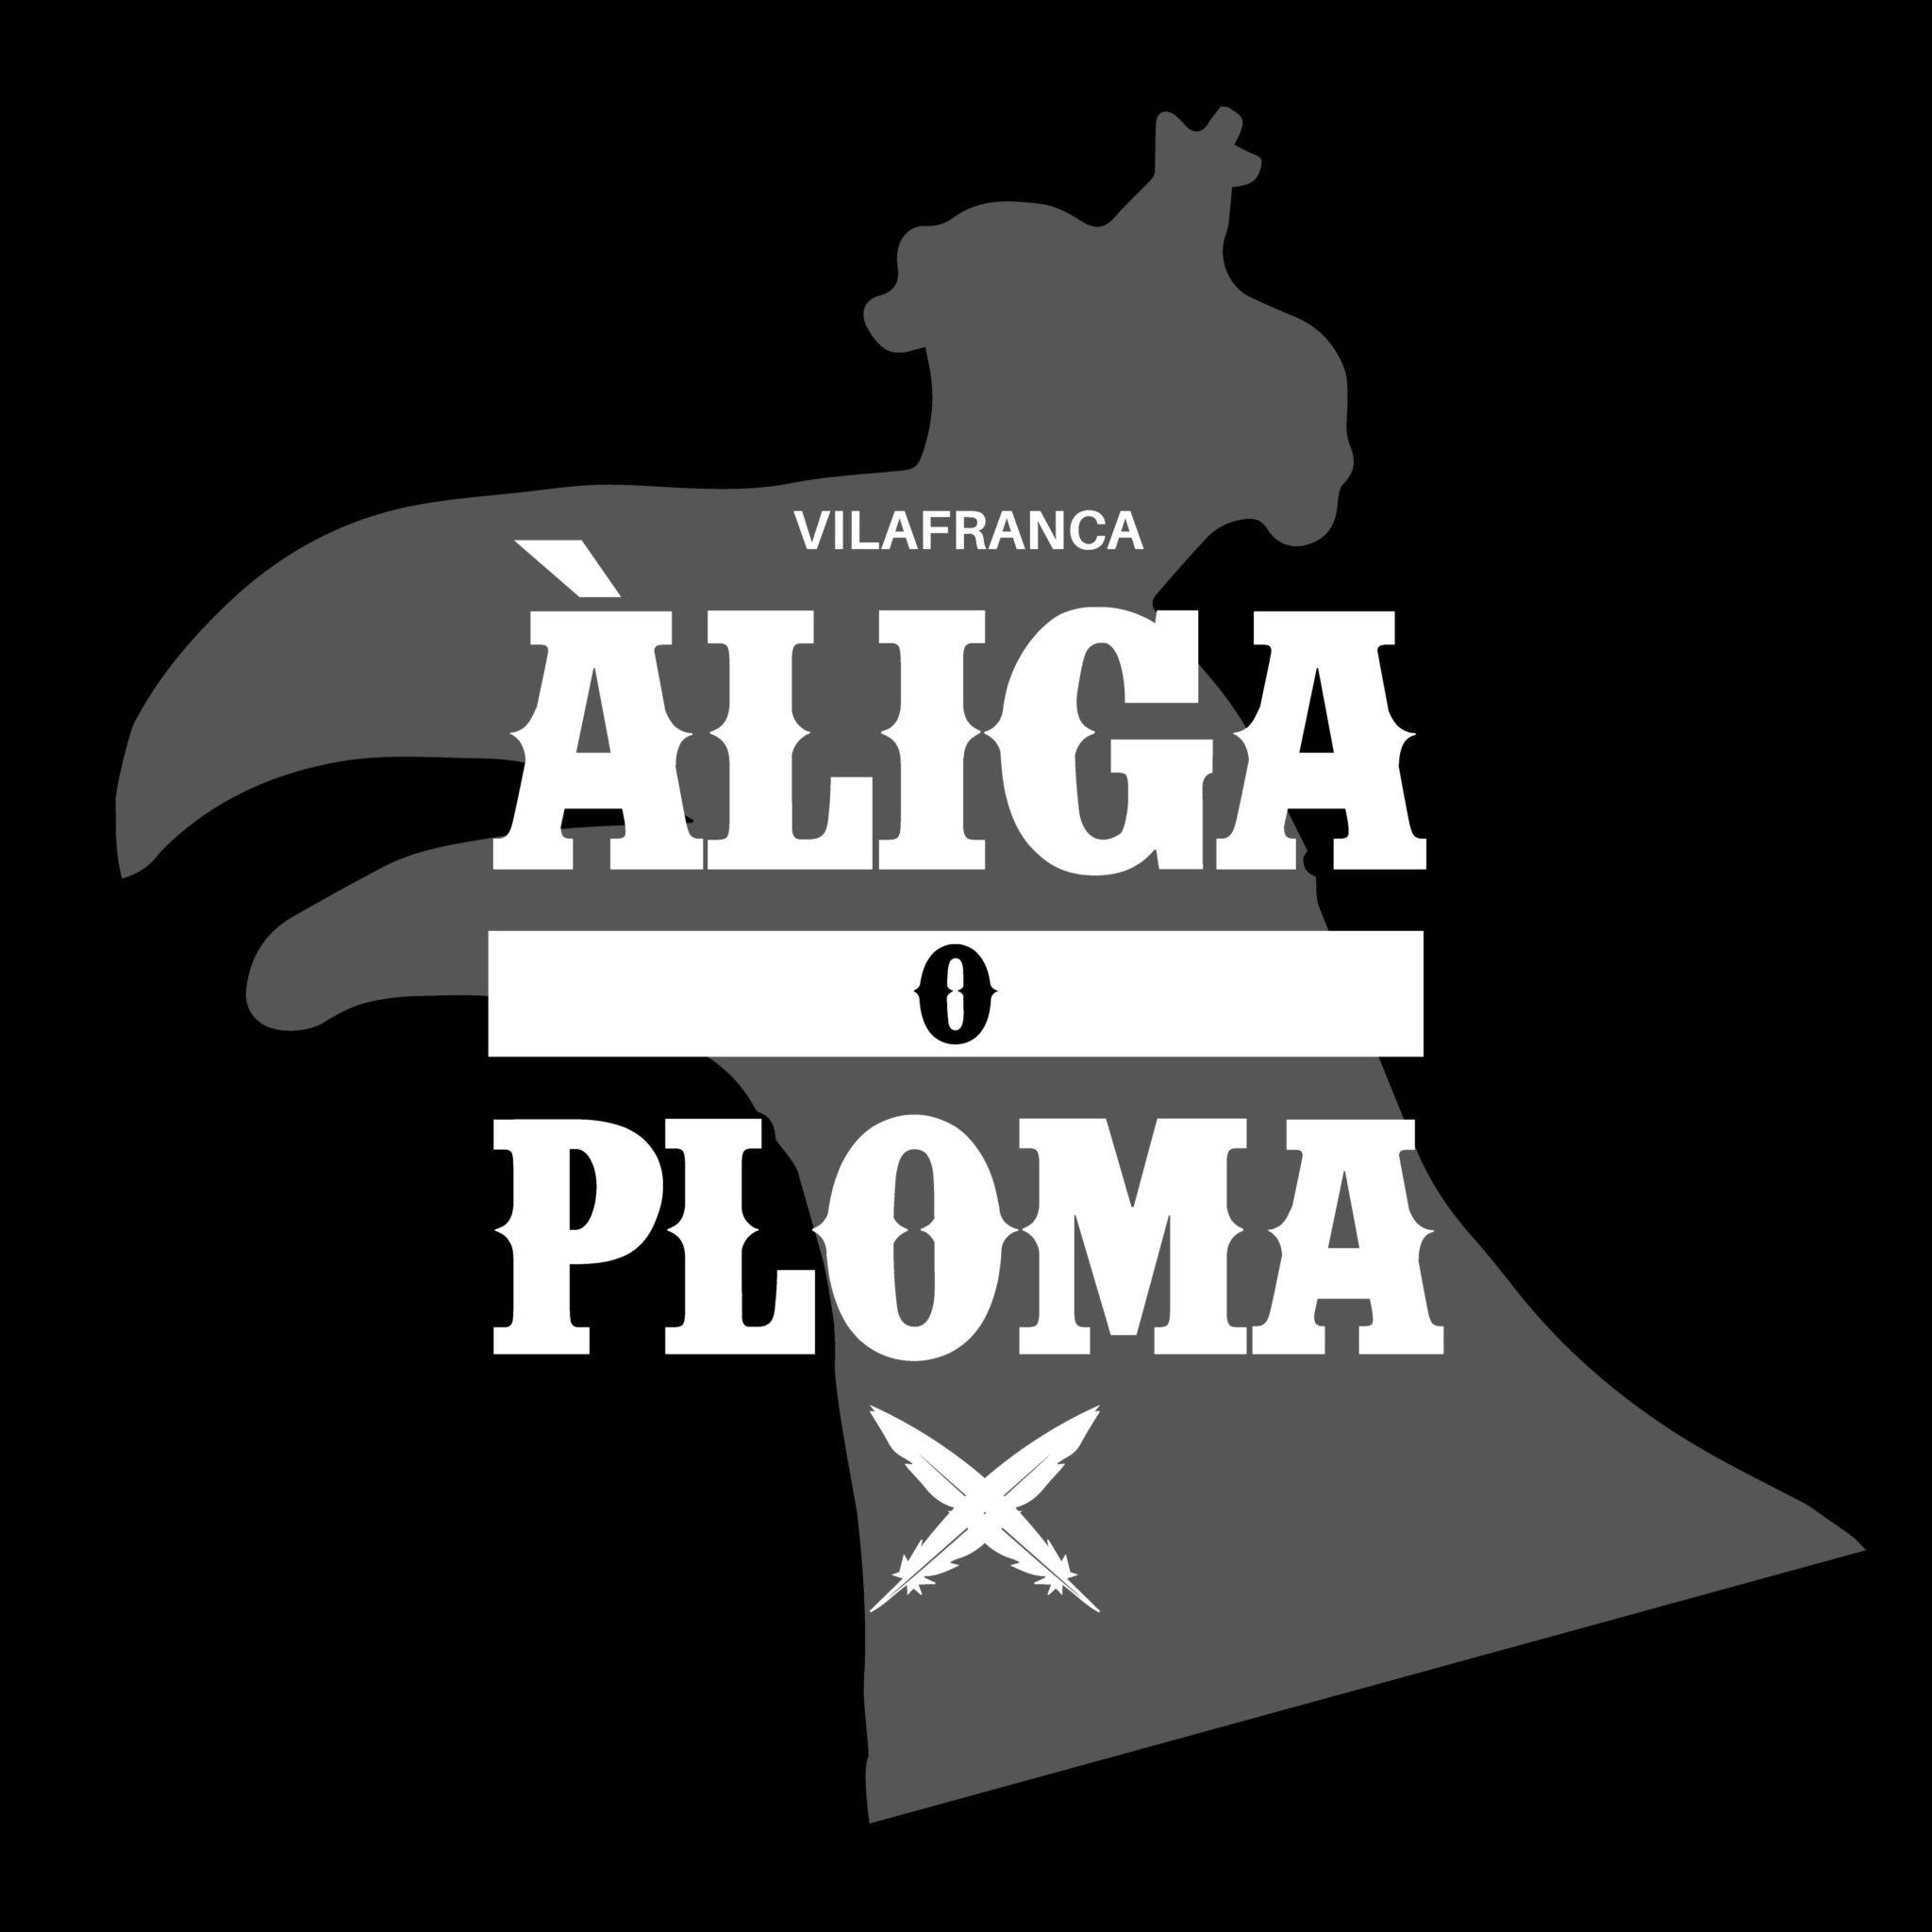 Aliga-Vilafranca-Plata-o-Plomo-Angels-Pinyol